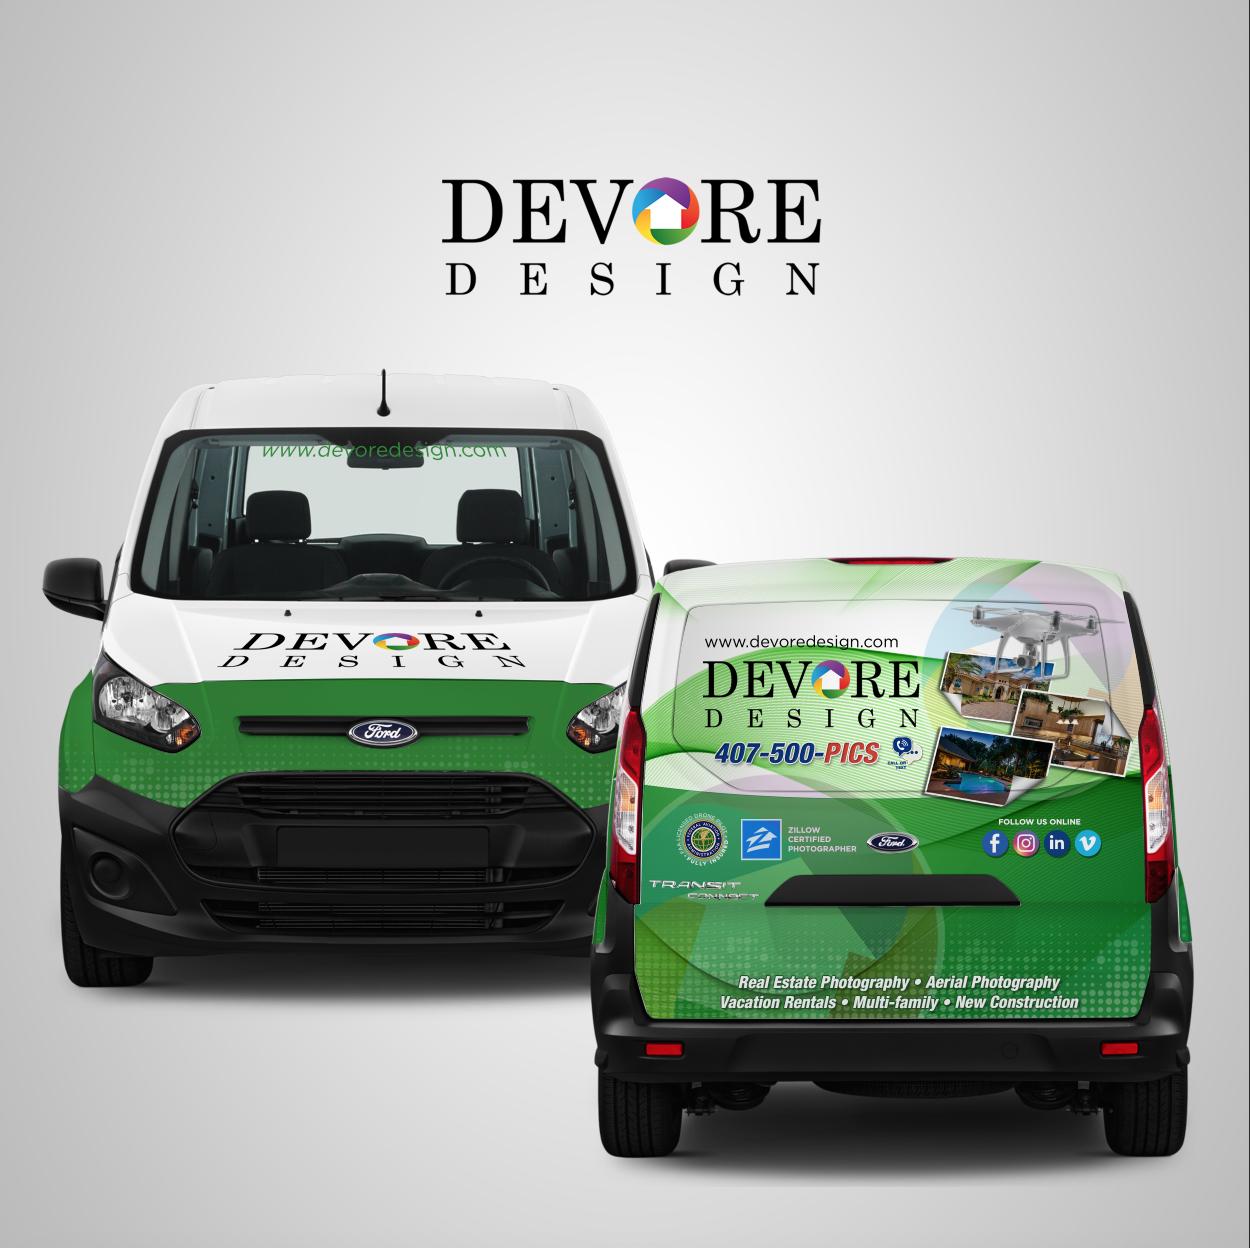 DeVore Design Vehicle Wrap